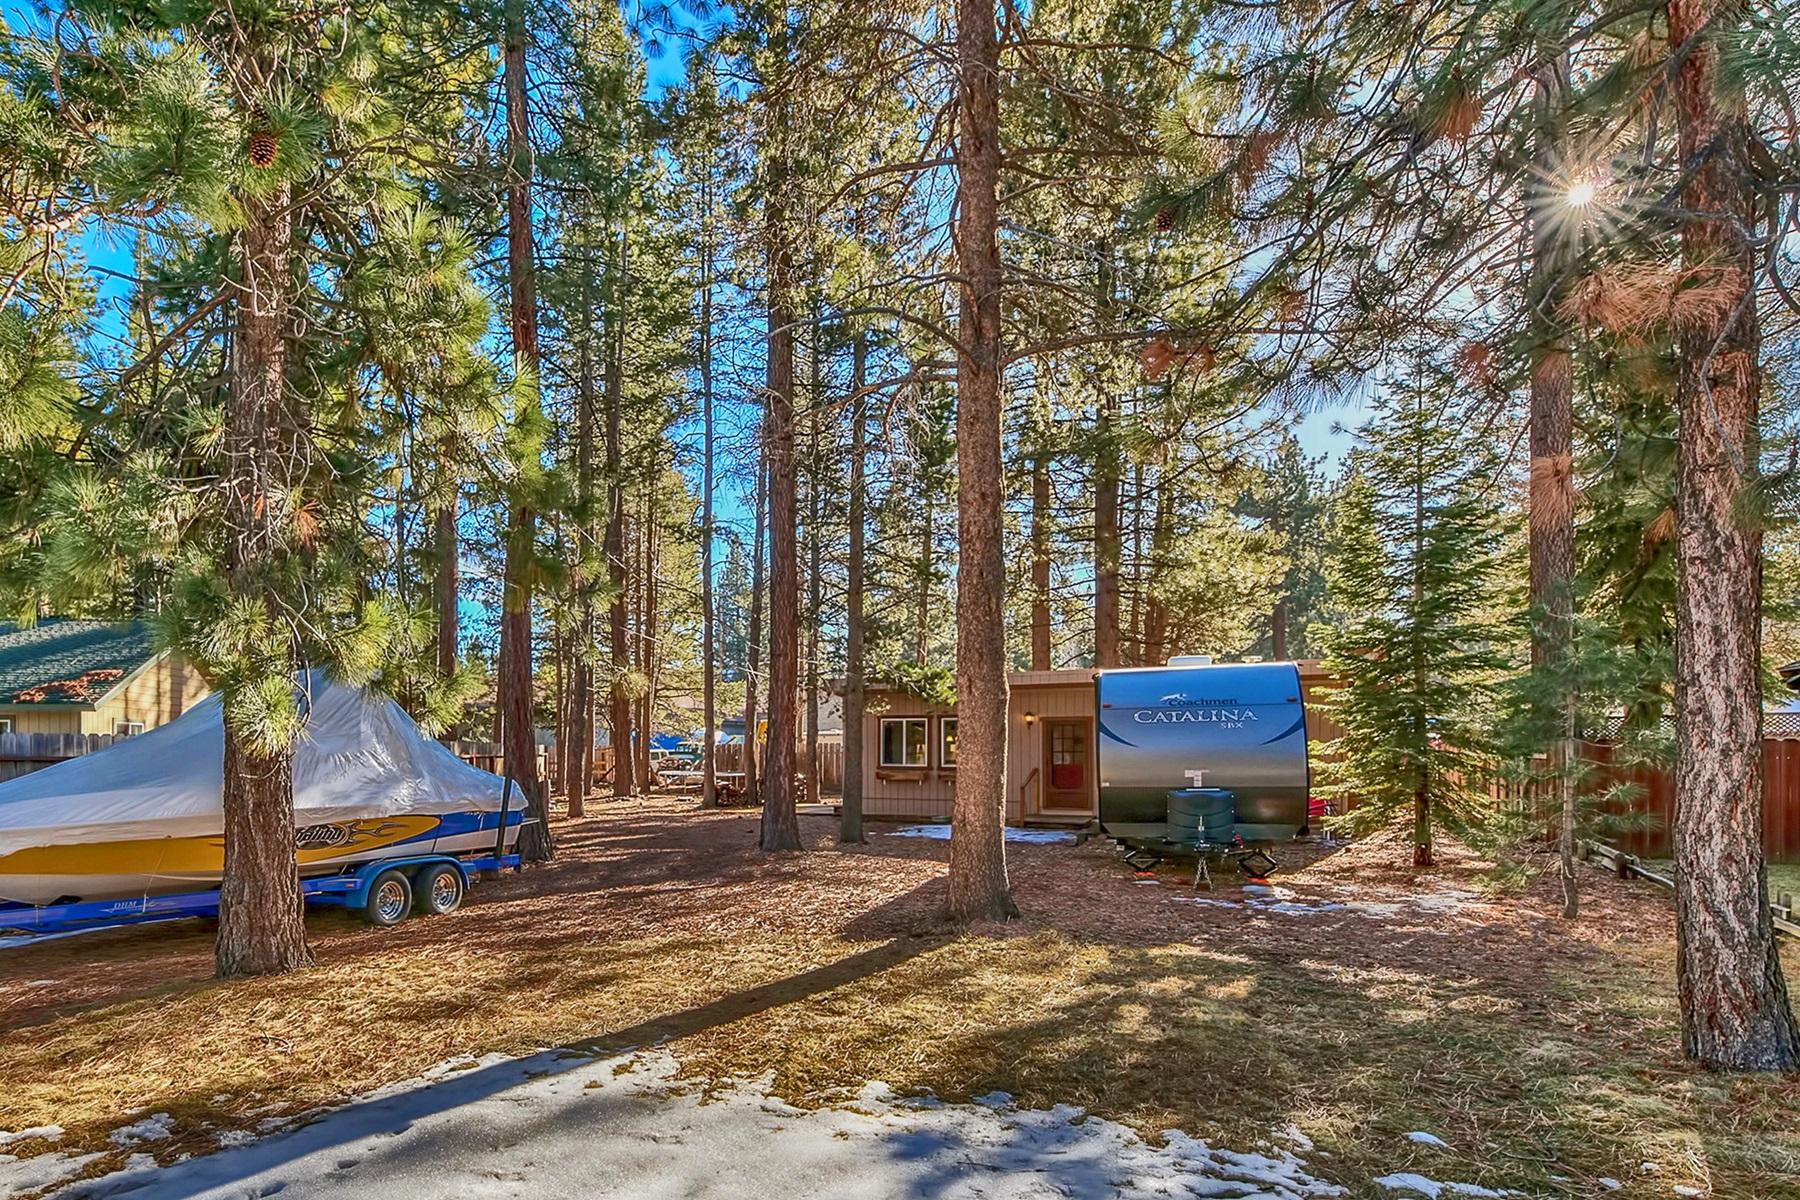 Additional photo for property listing at 926 Patricia Lane, South Lake Tahoe, CA 96150 926 Patricia Lane South Lake Tahoe, California 96150 United States